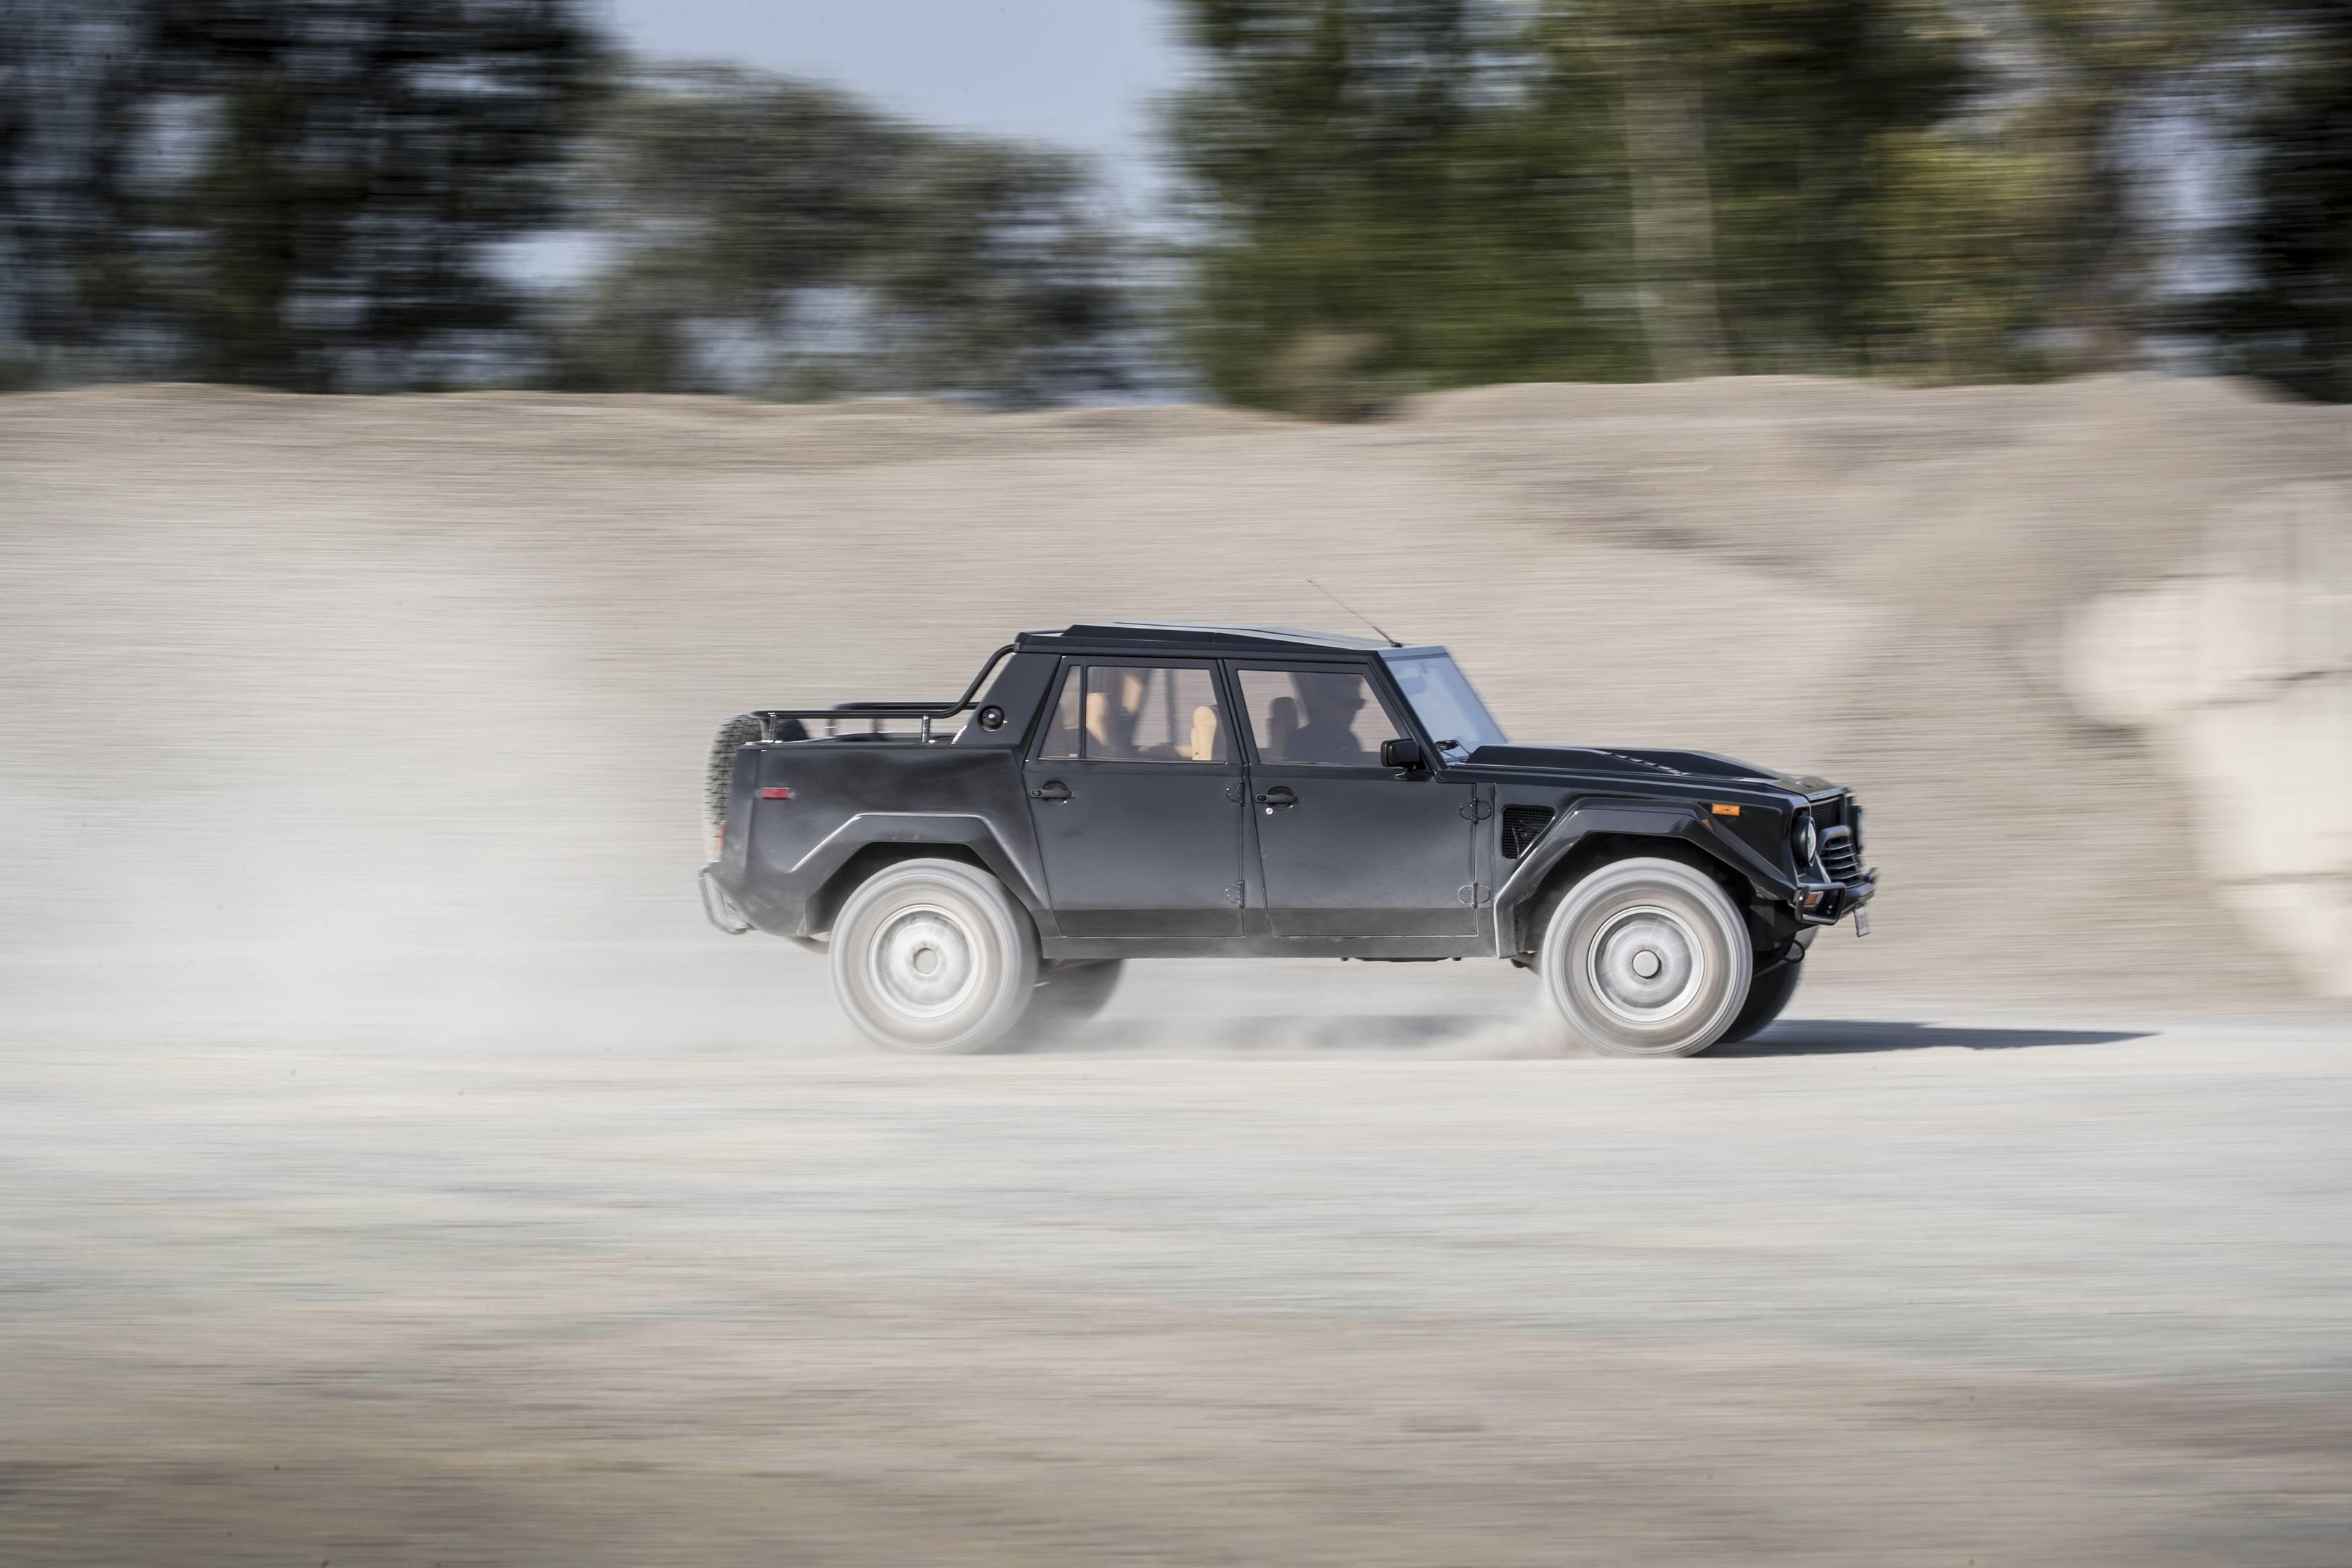 Lamborghini LM002 driving off road